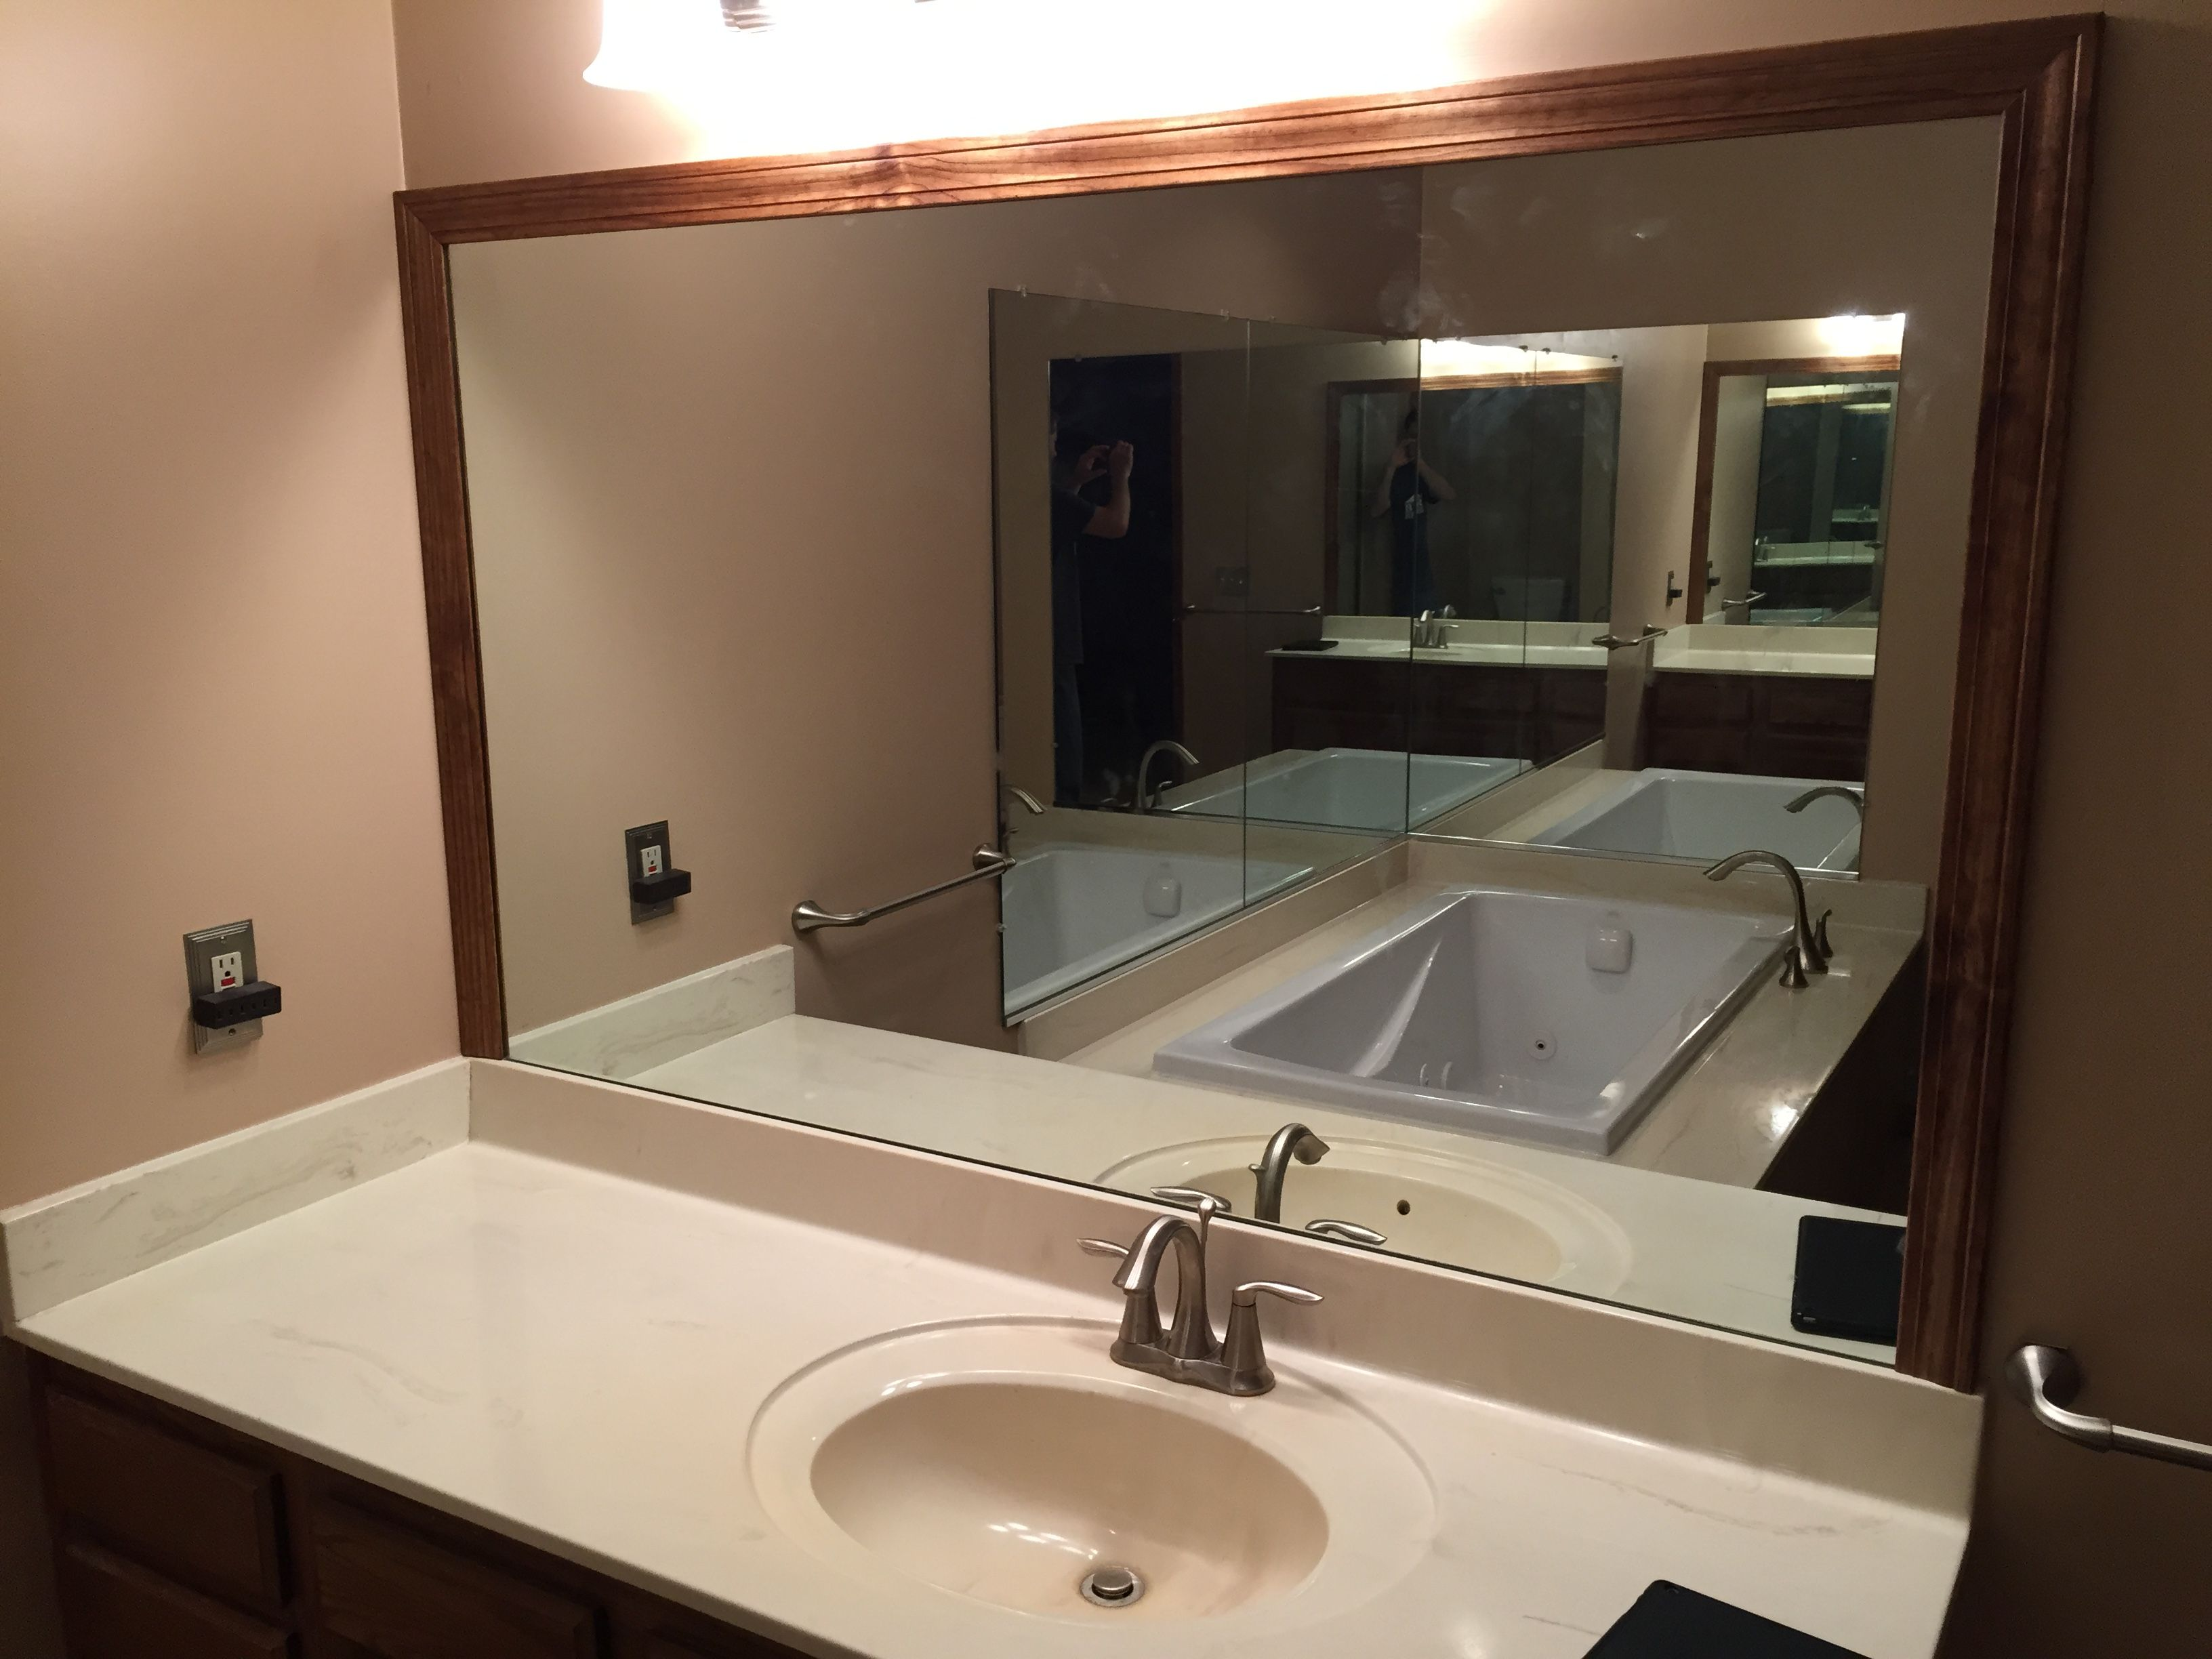 pin freestanding jet with oval tullia spa tub tubs whirlpool world jetted venzi bathtub x